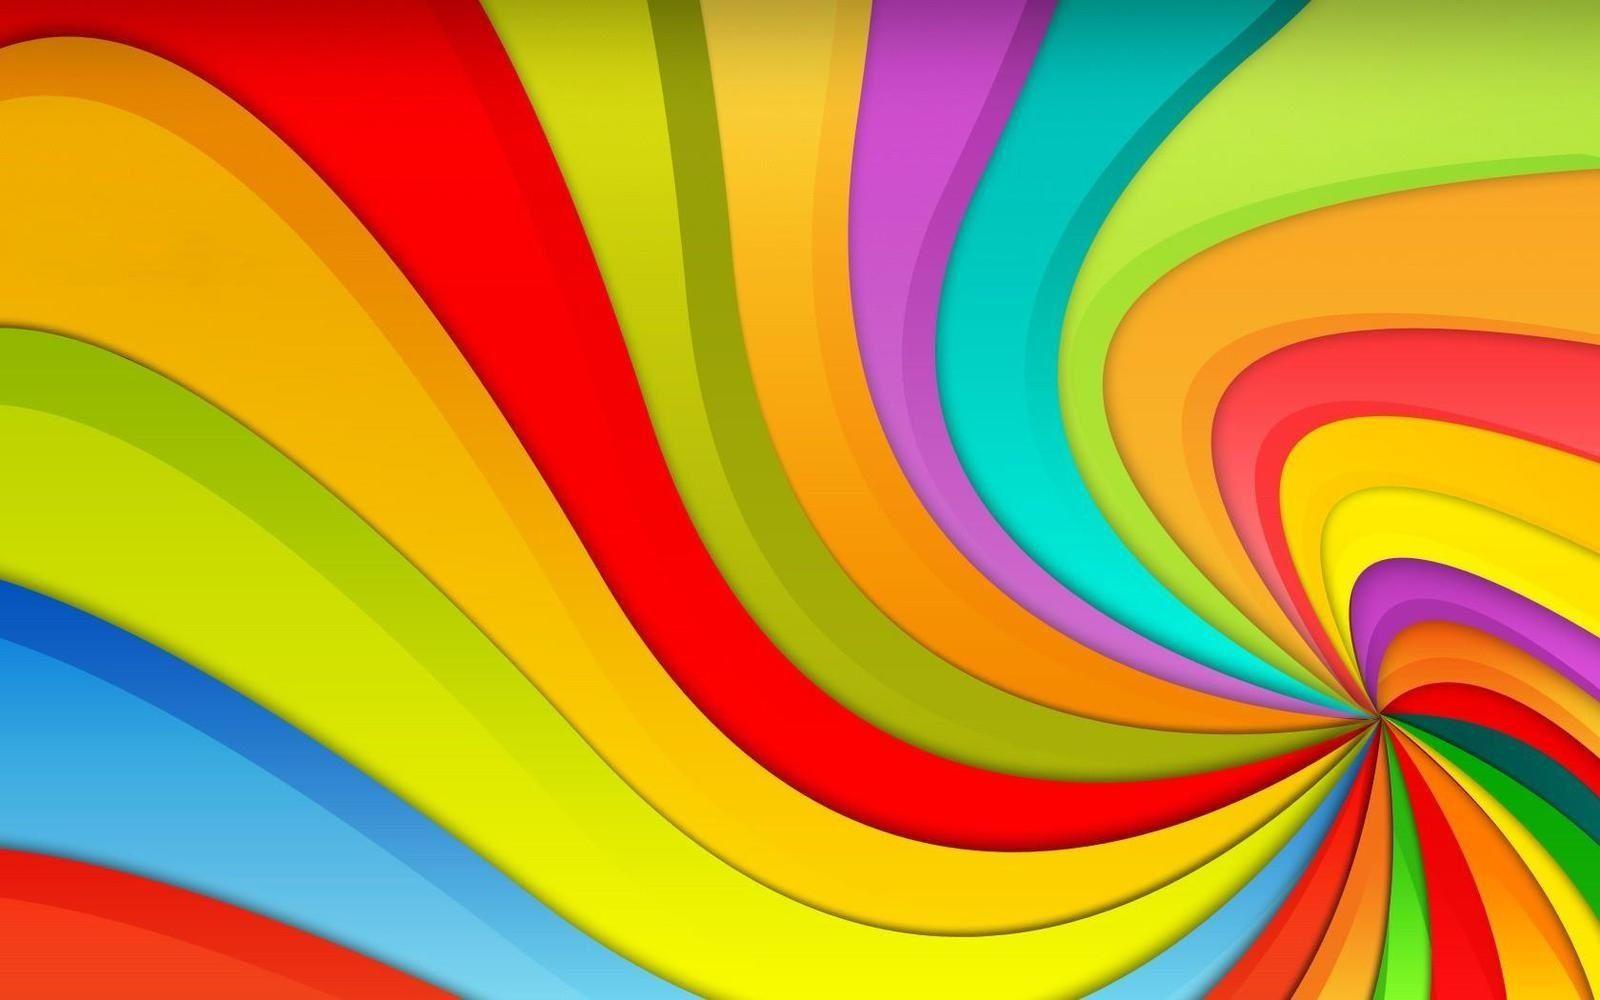 Fond D Ecran Multicolor Fond D Ecran Abstrait Fond D Ecran Arc En Ciel Fond D Ecran Colore